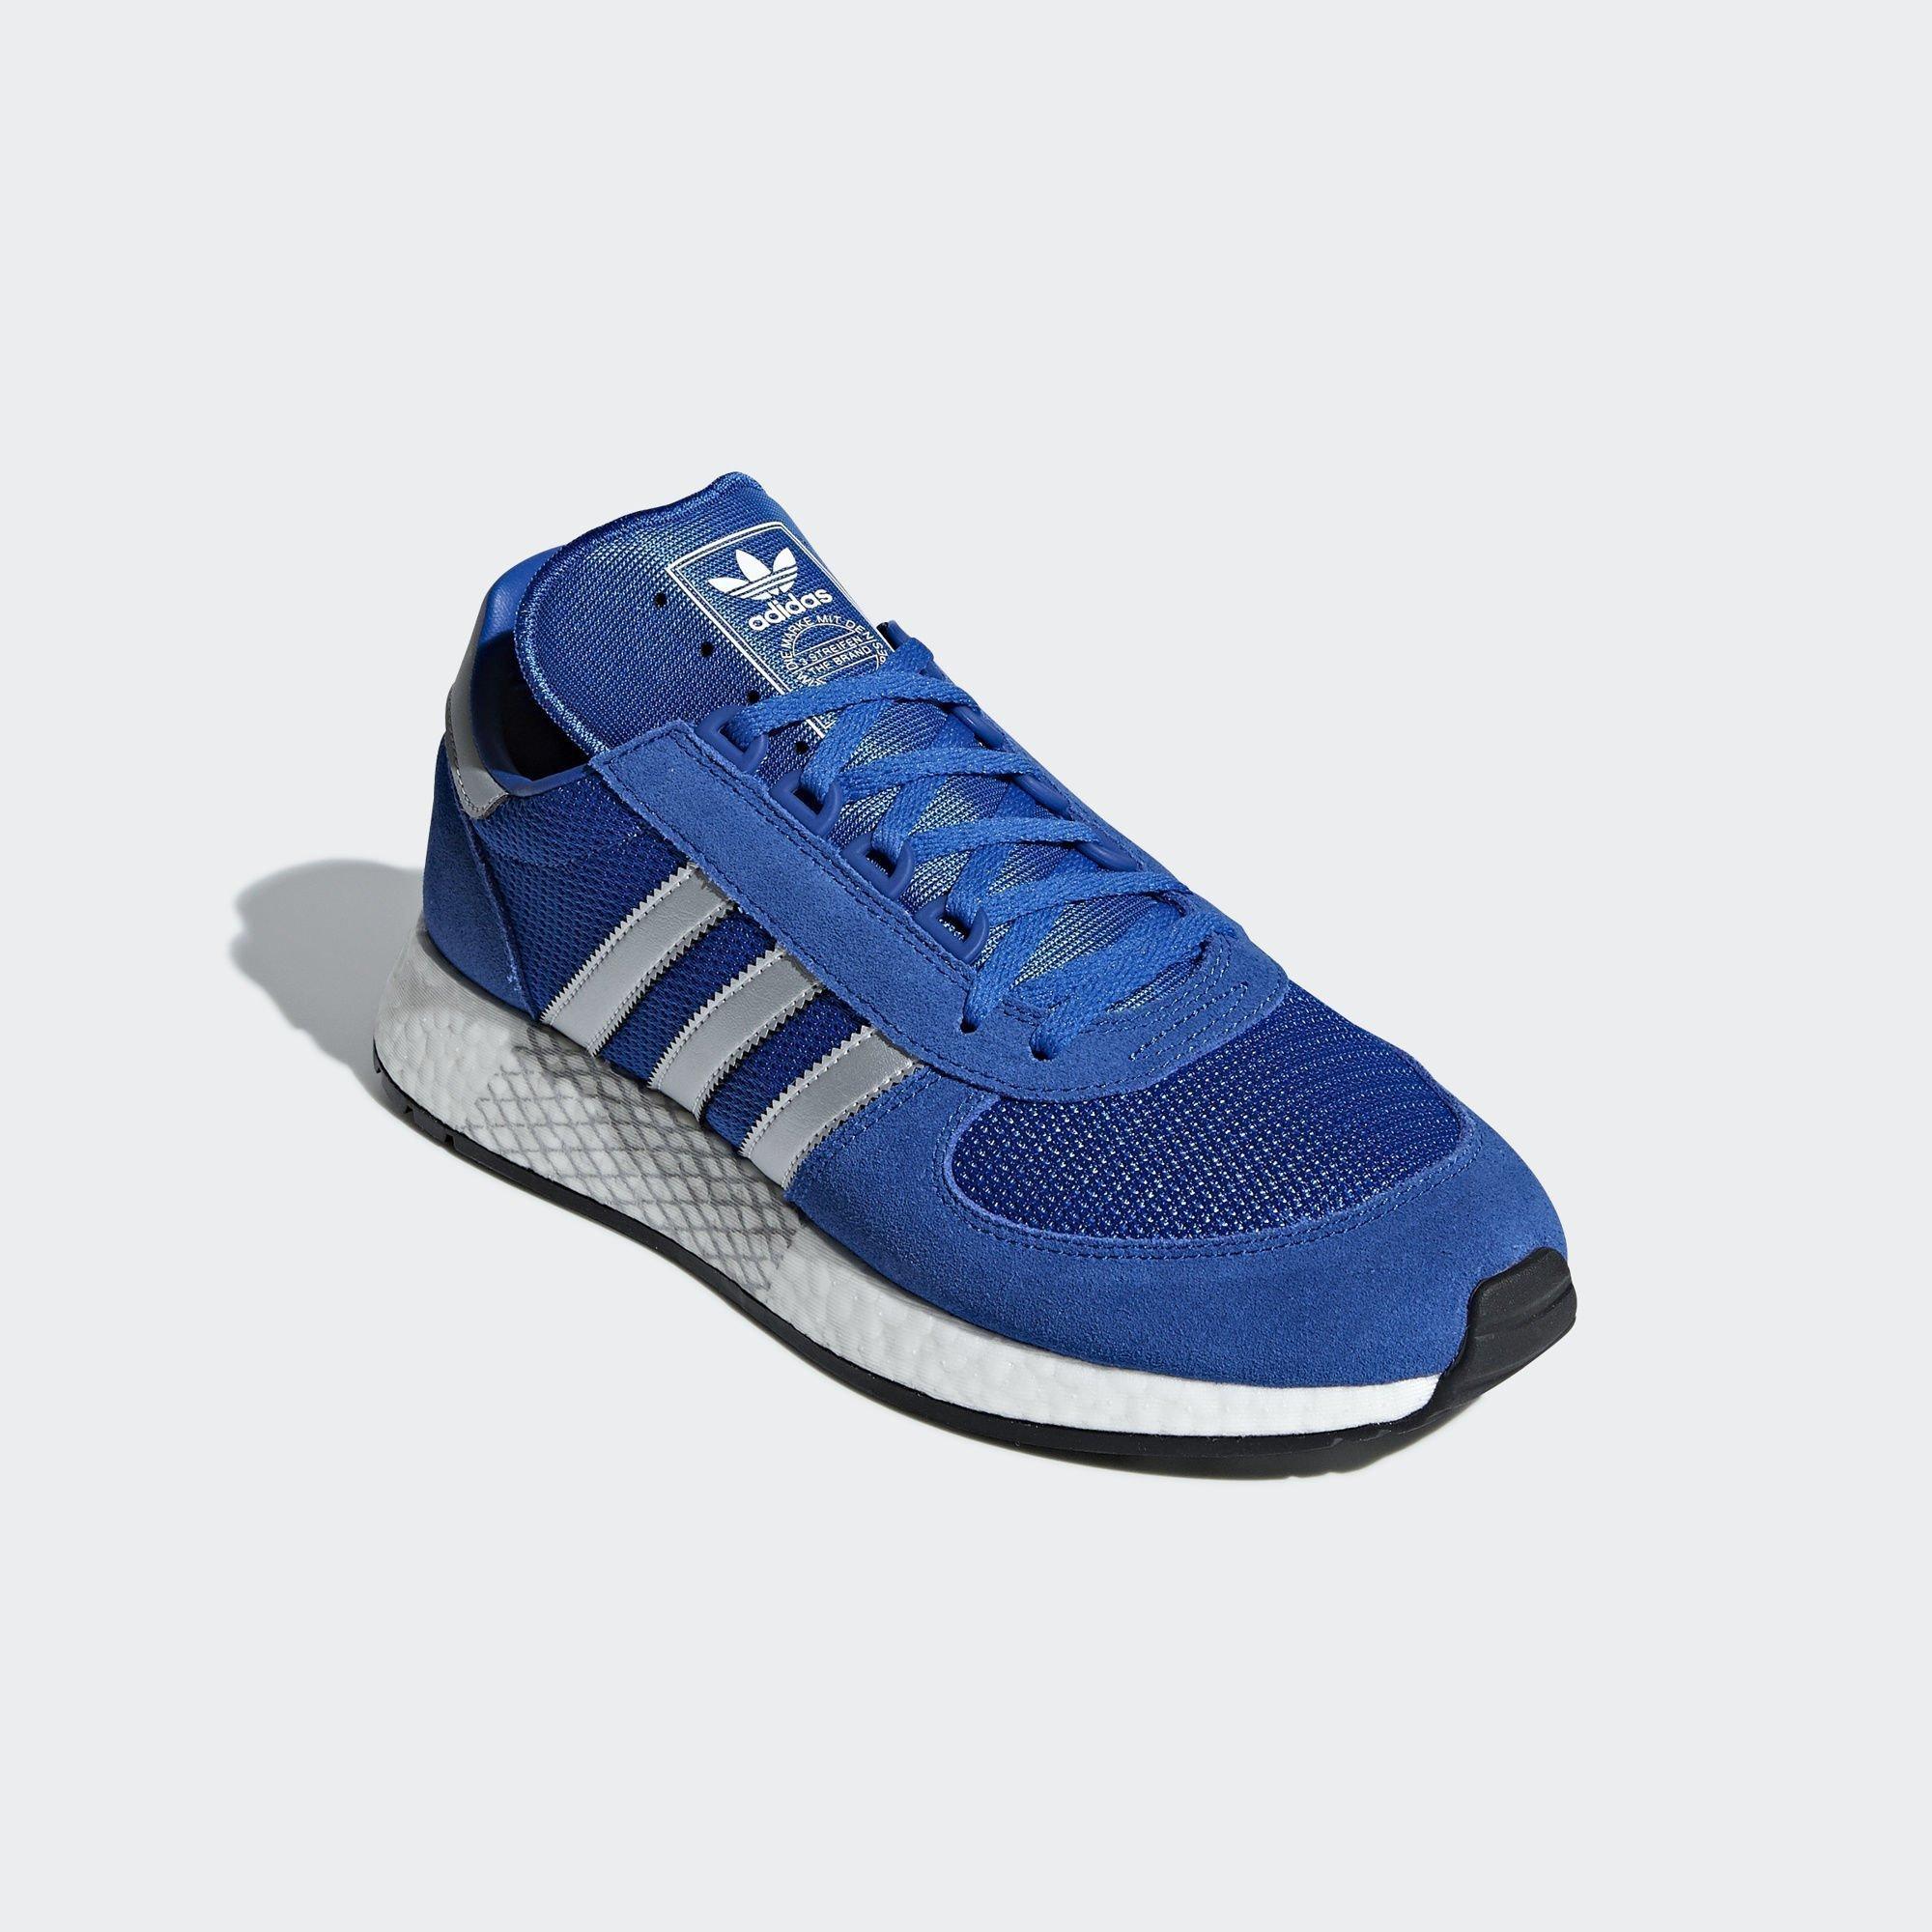 Adidas Marathon G26782